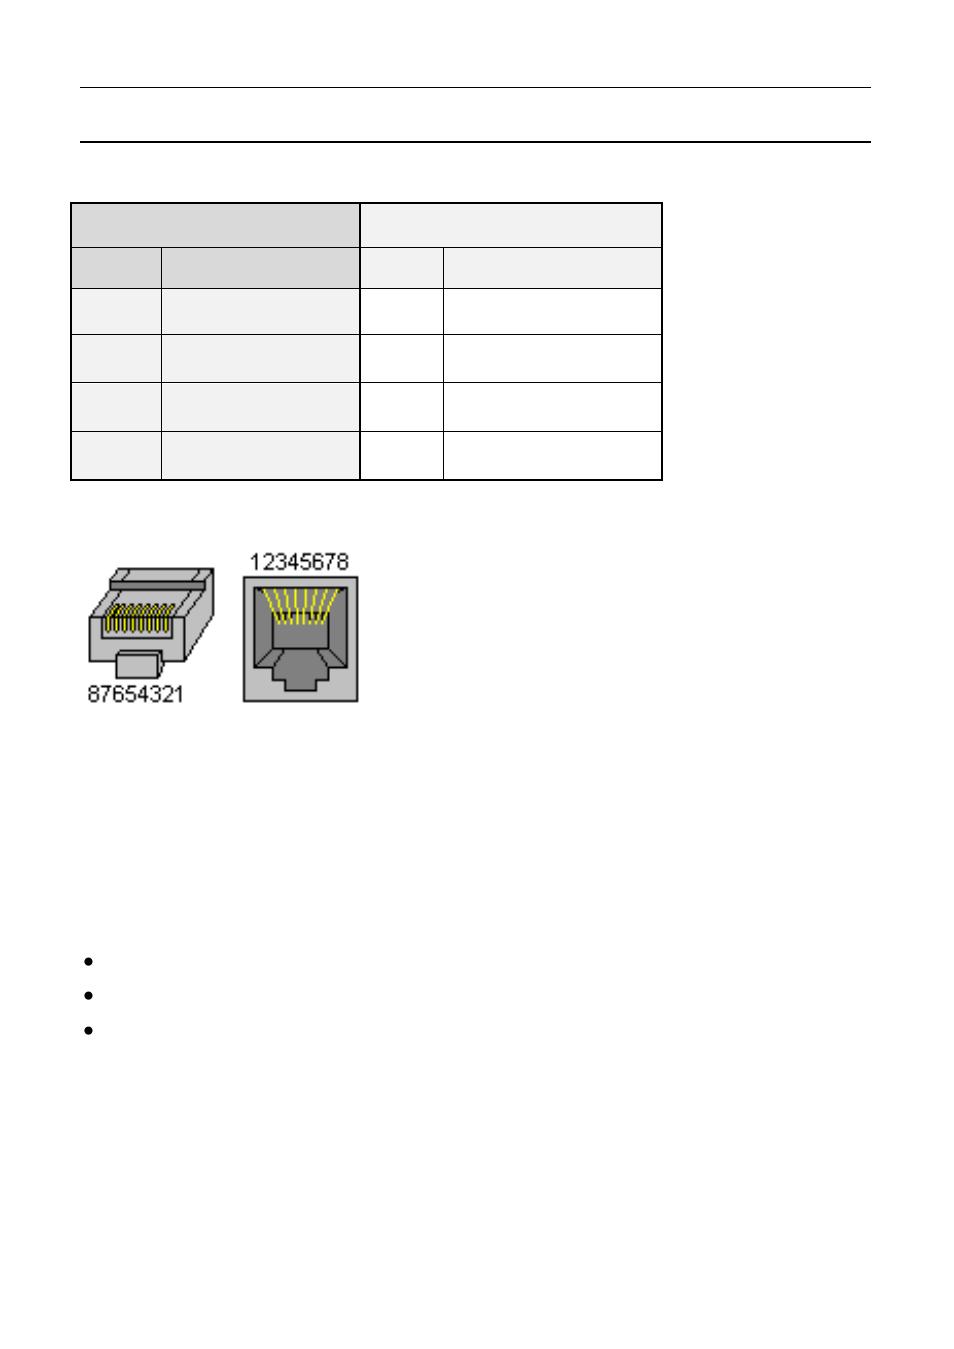 hight resolution of ethernet wiring diagram tx rx basic electronics wiring diagram ethernet wiring diagram tx rx